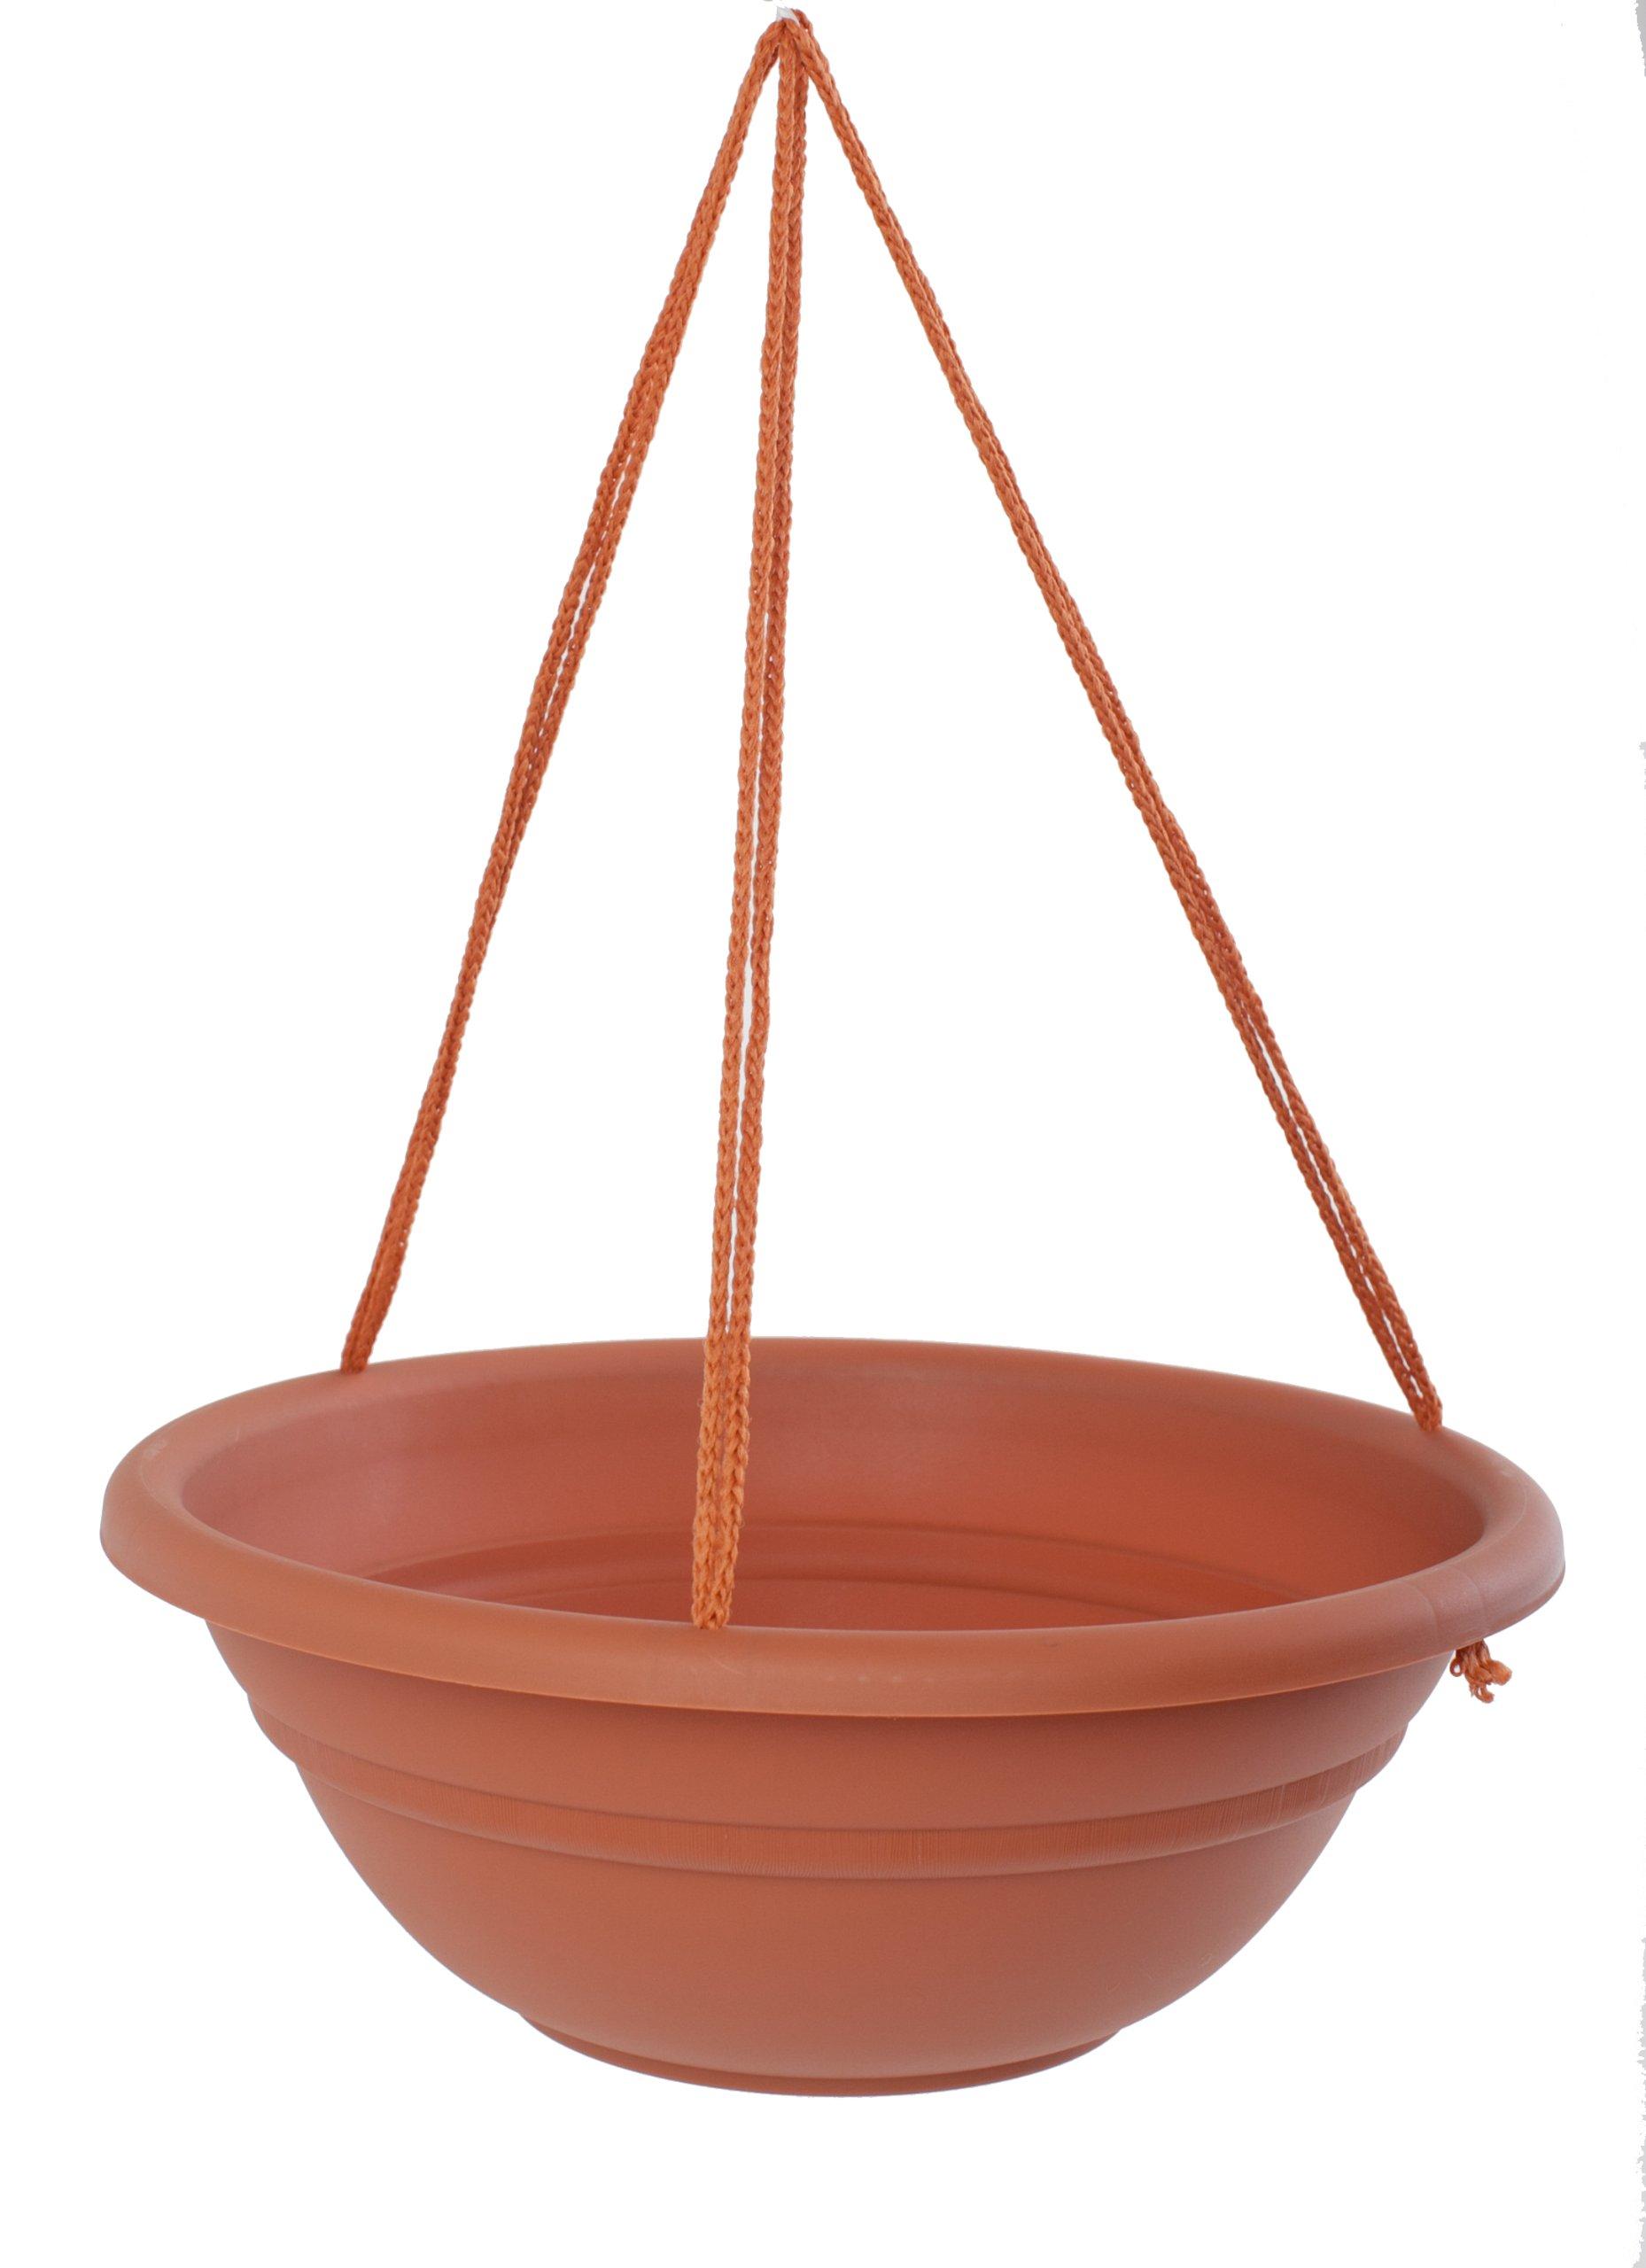 Bloem MBHB151746-12 12-Pack Milano Hanging Basket/Planter, 17-Inch, Terra Cotta